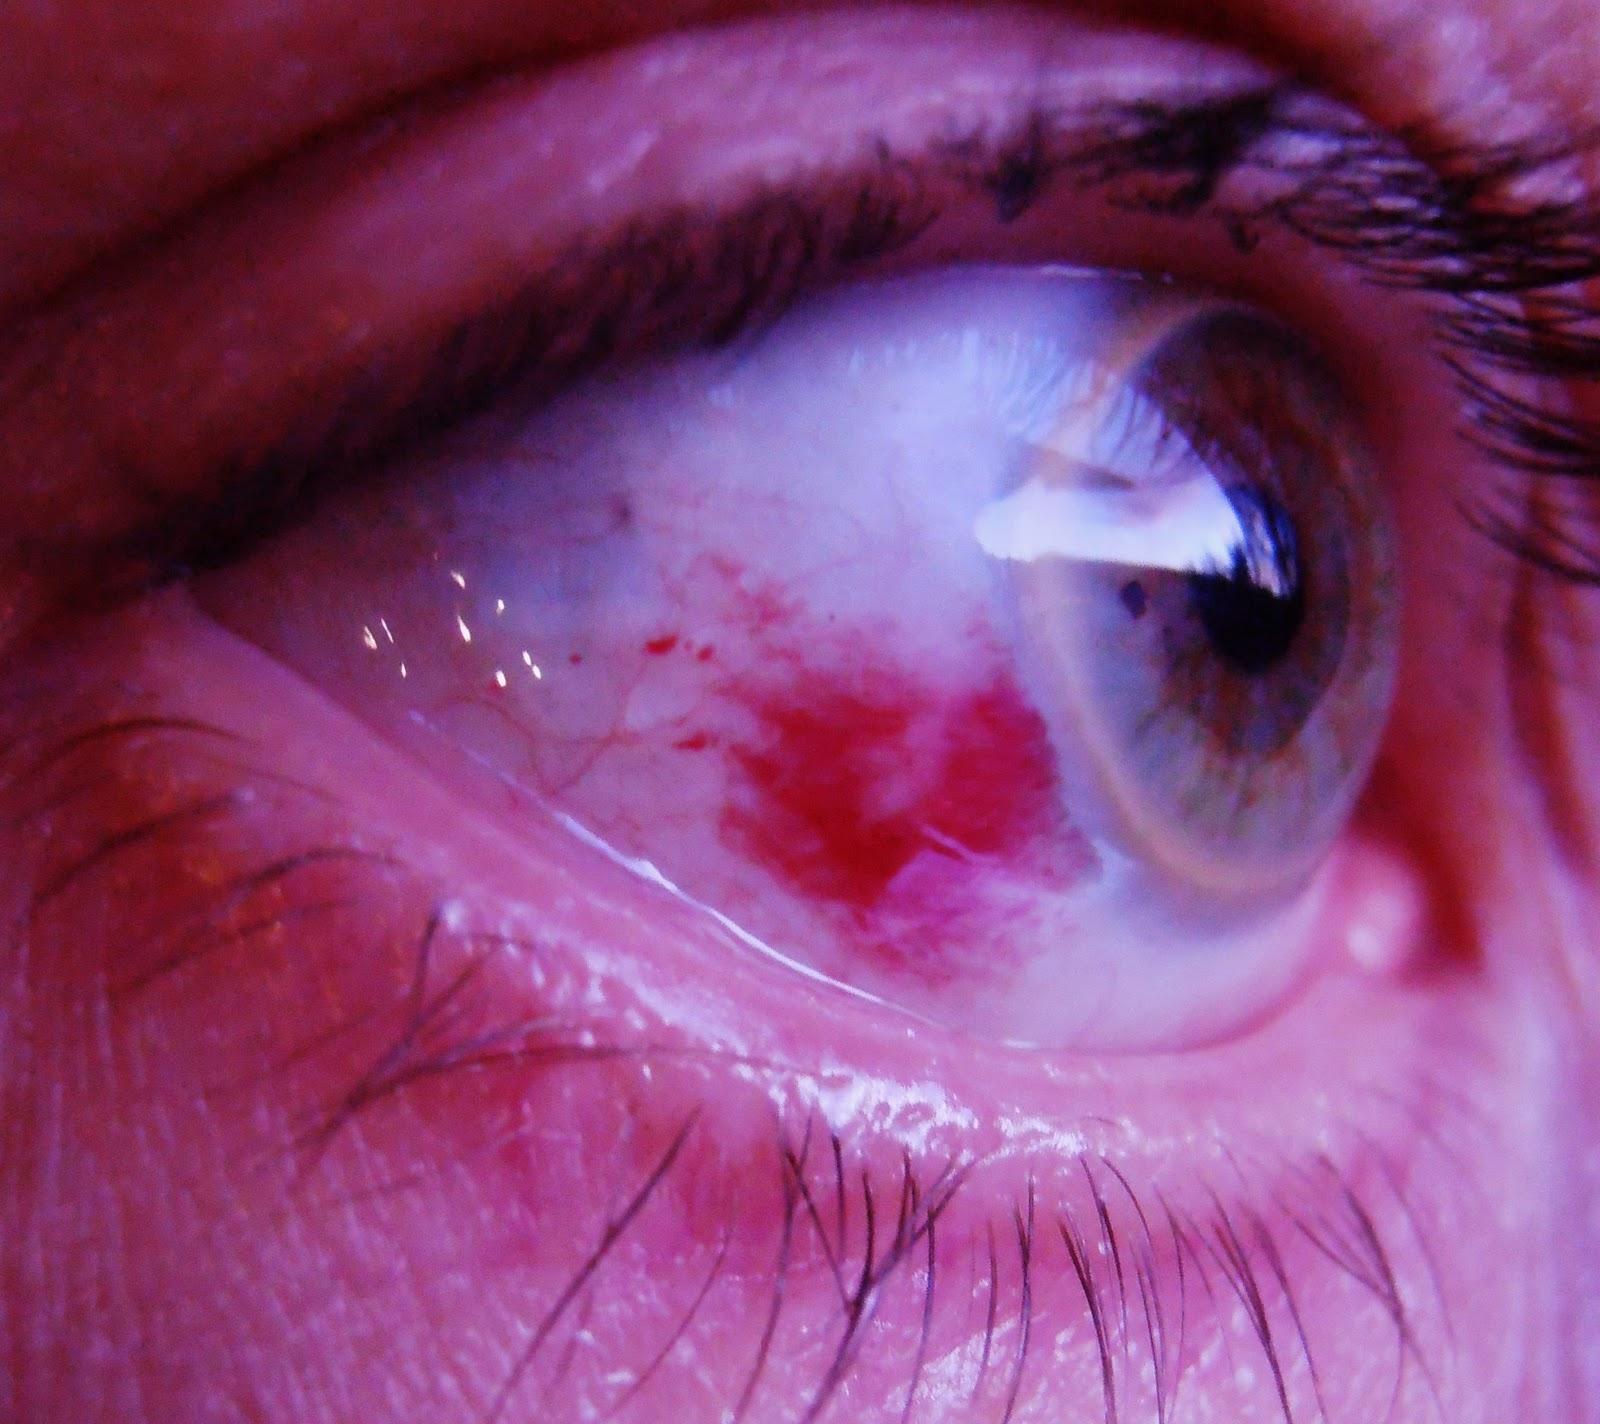 röd i ögat länge